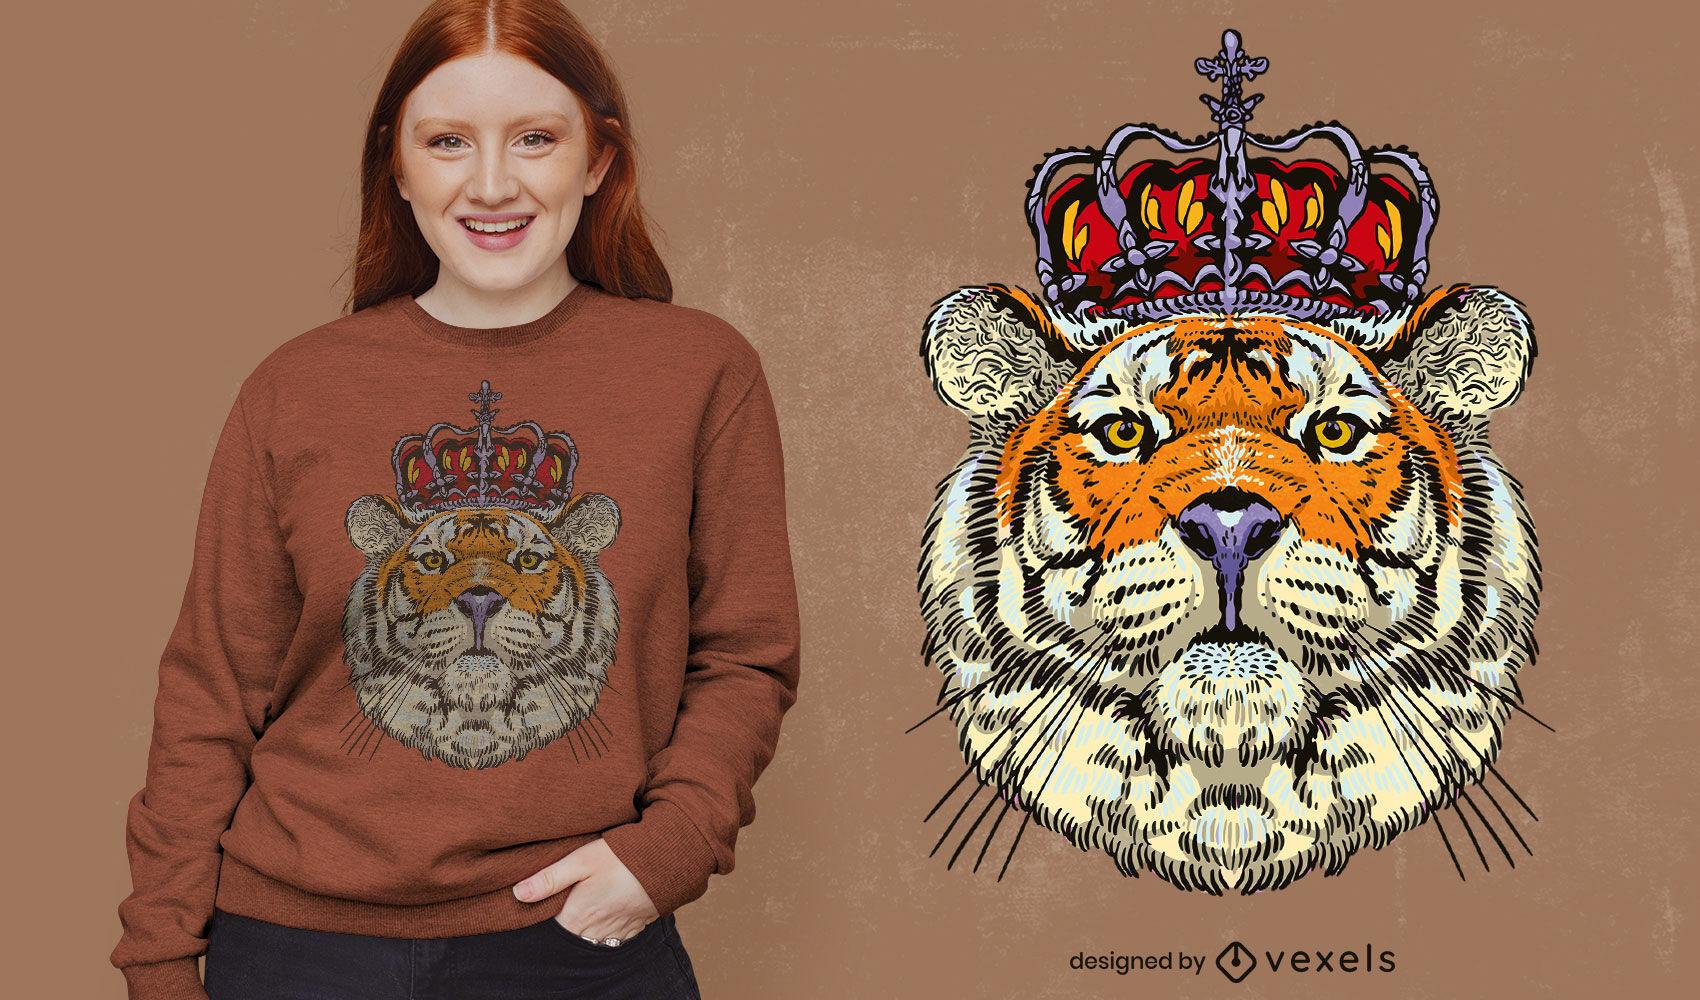 King tiger animal with crown t-shirt design